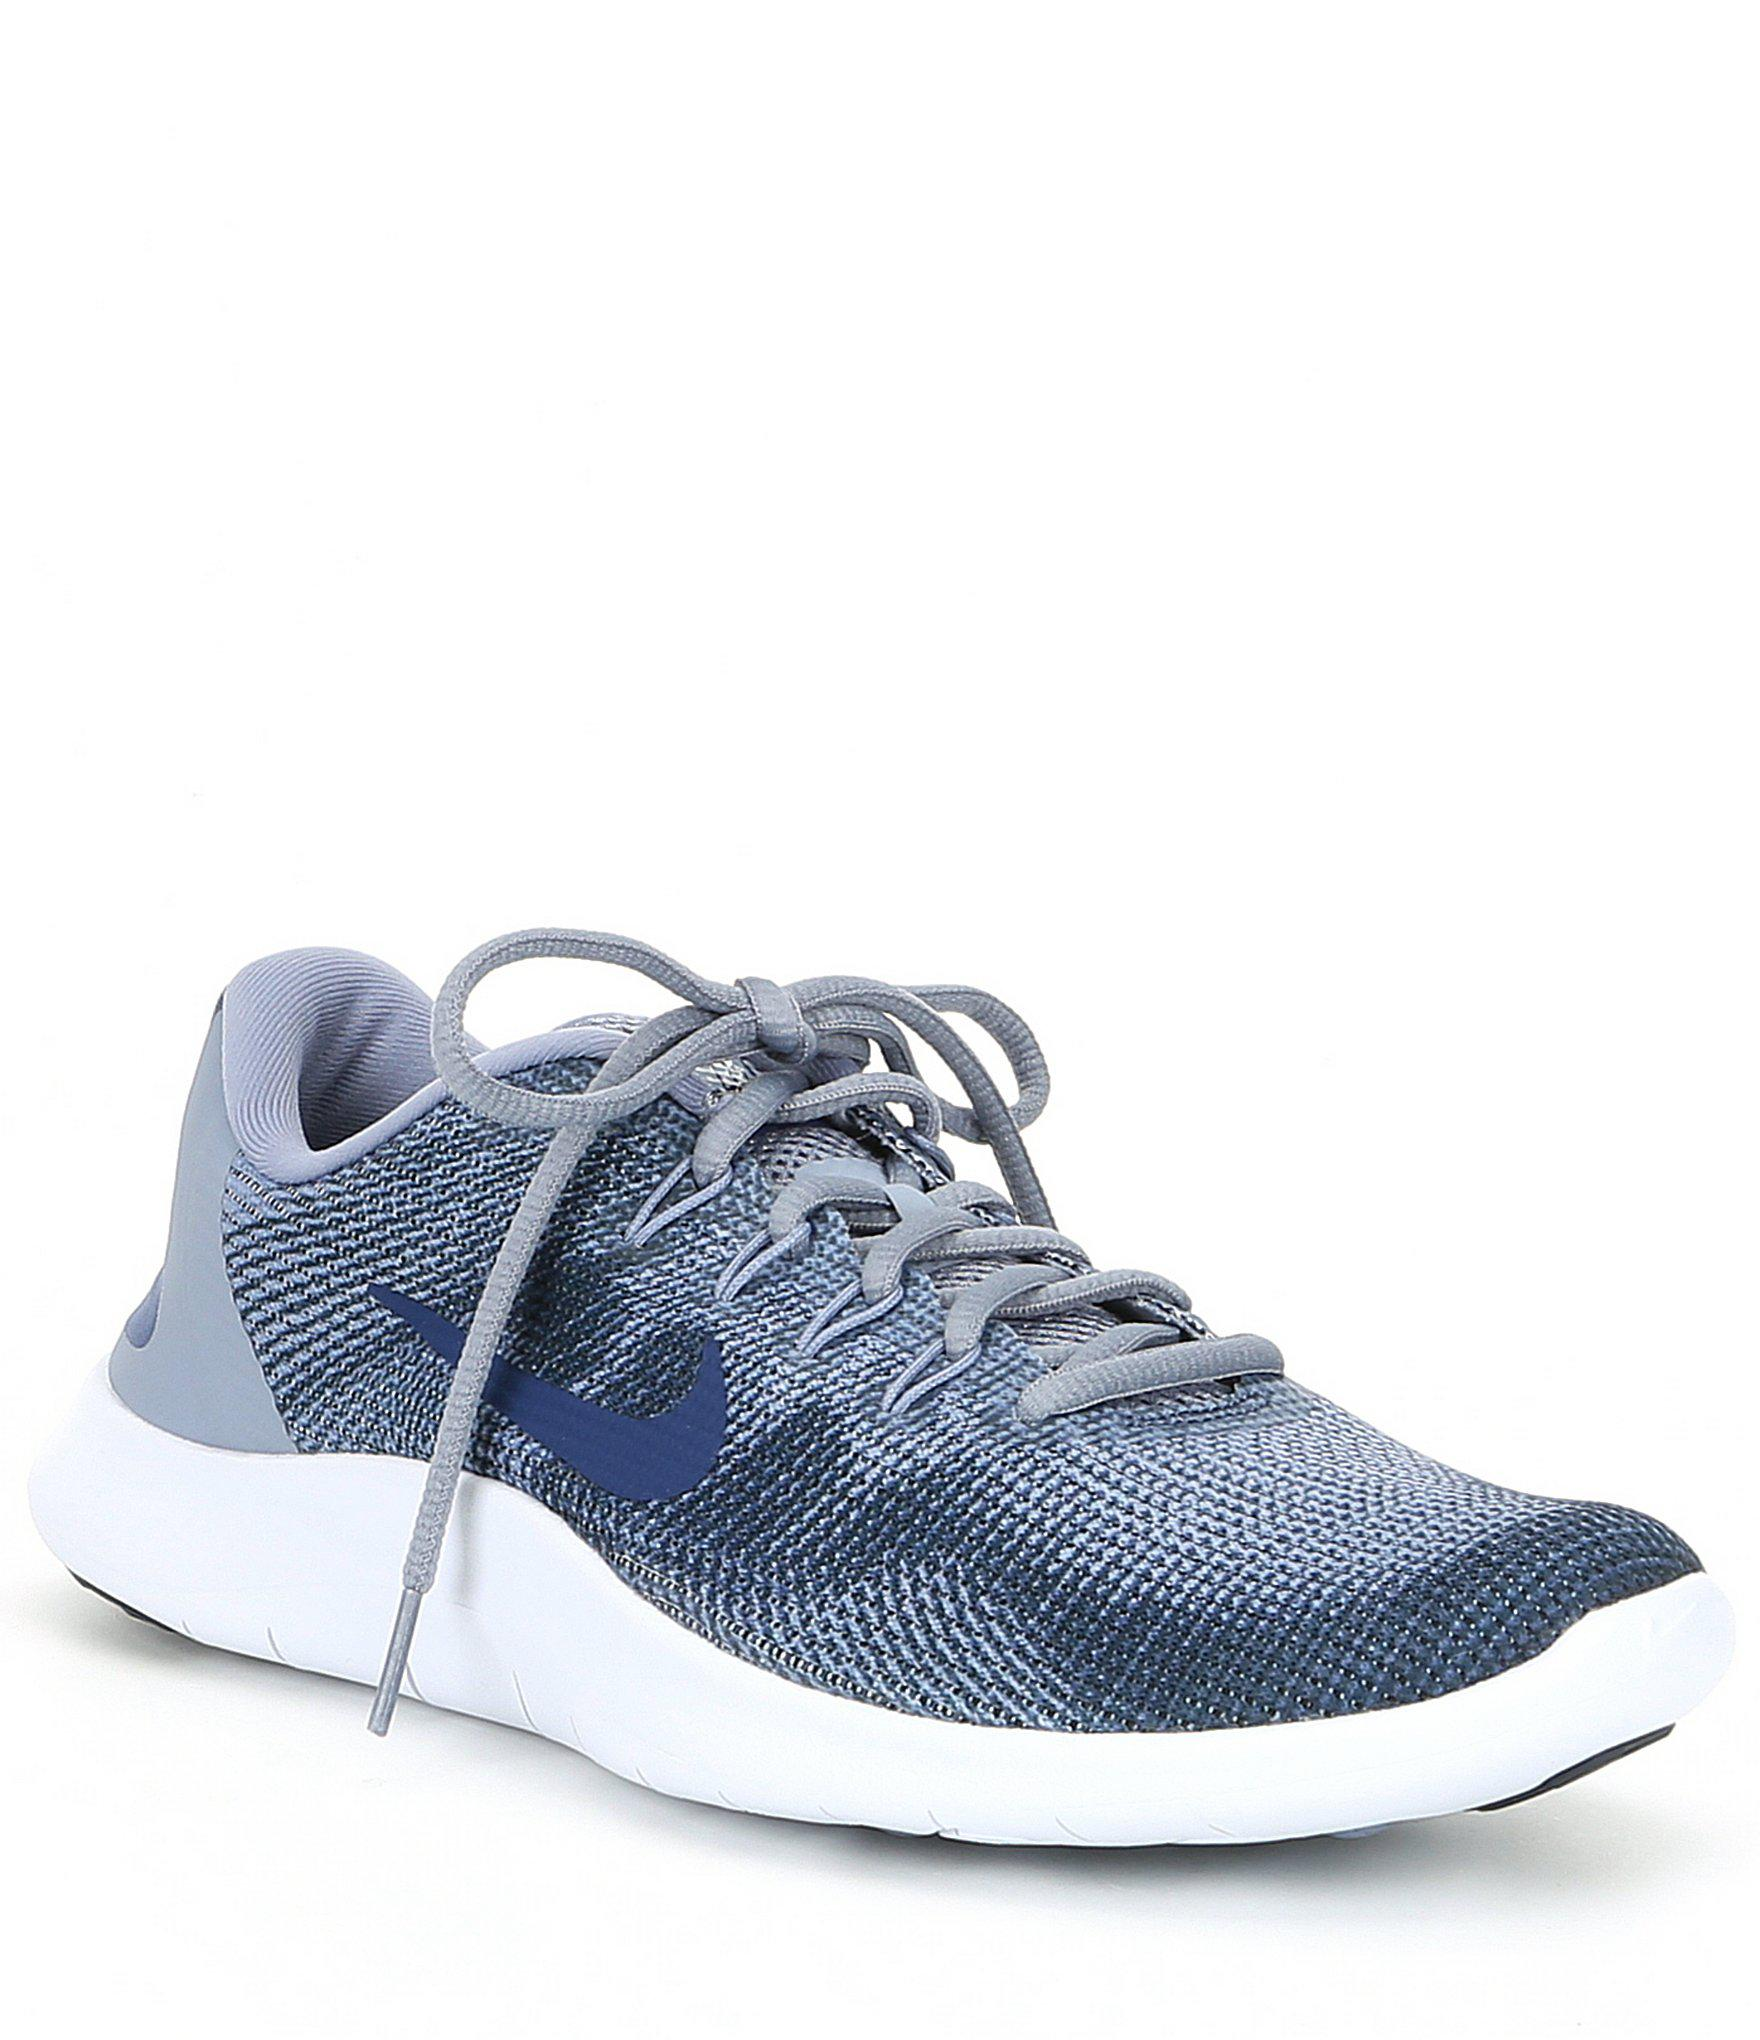 4c9b9d941784a Lyst - Nike Men s Flex 2018 Rn Running Shoes in Blue for Men